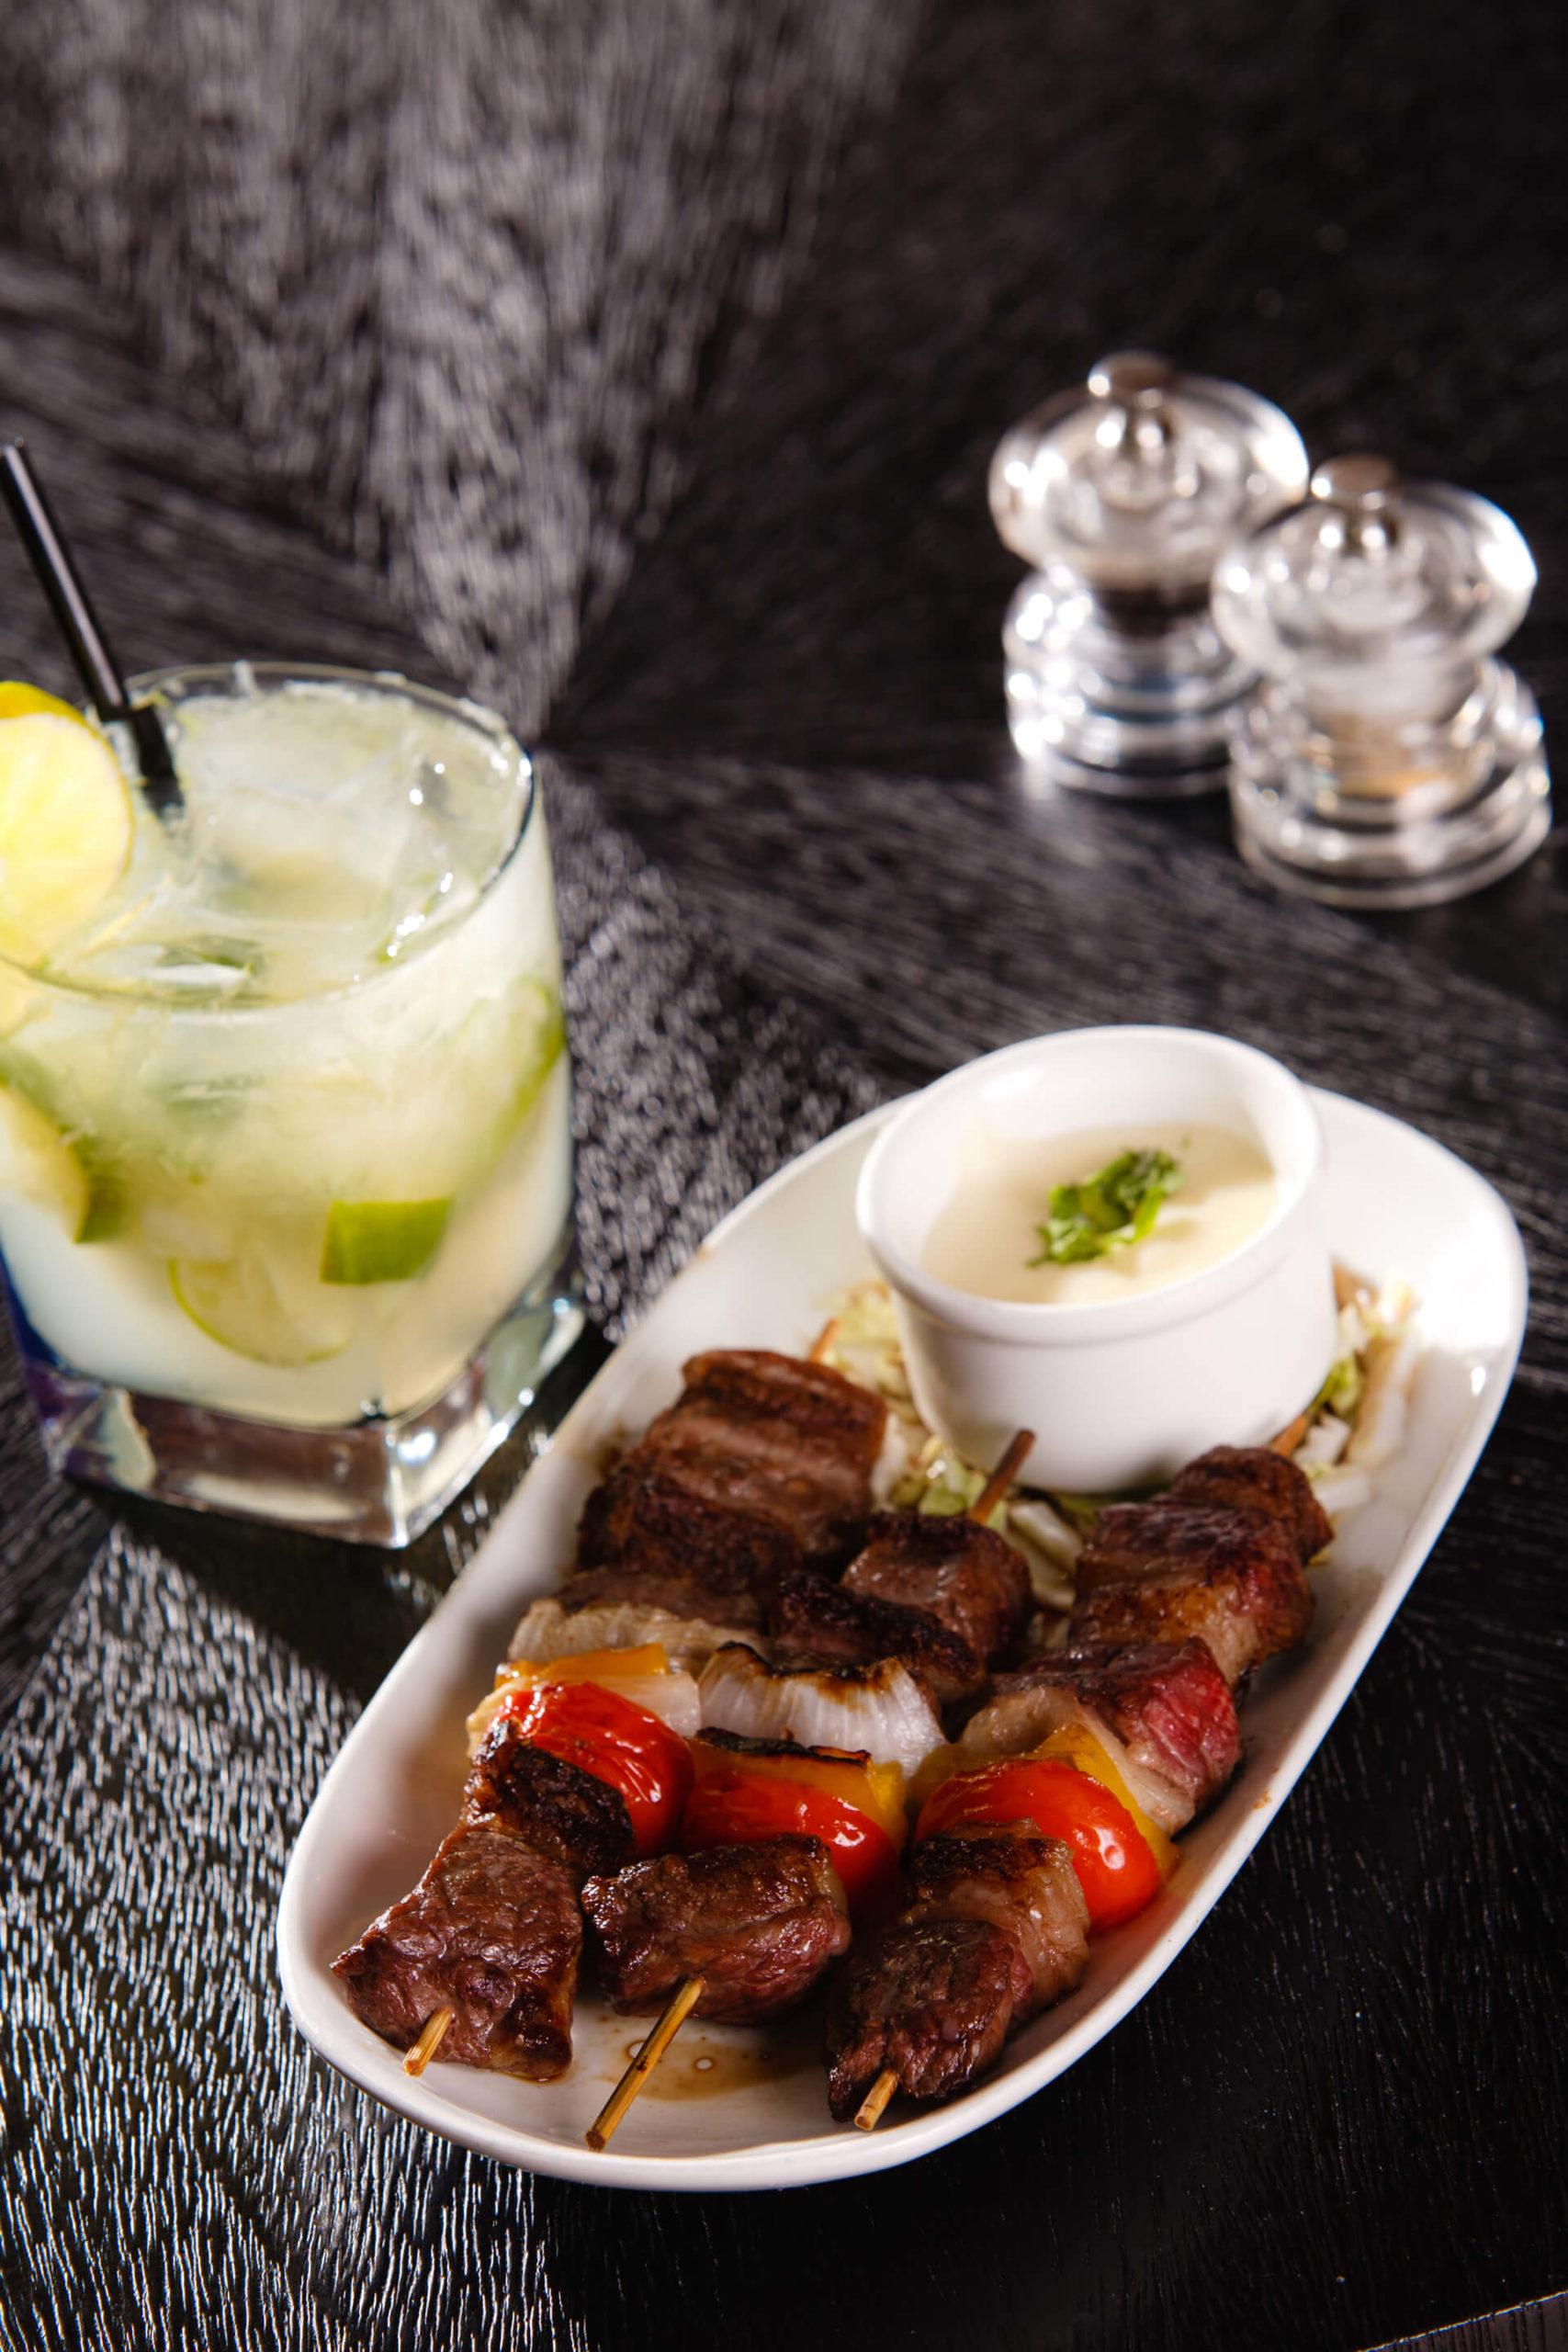 Best Restaurants in Fort Lauderdale for Graduation Celebrations